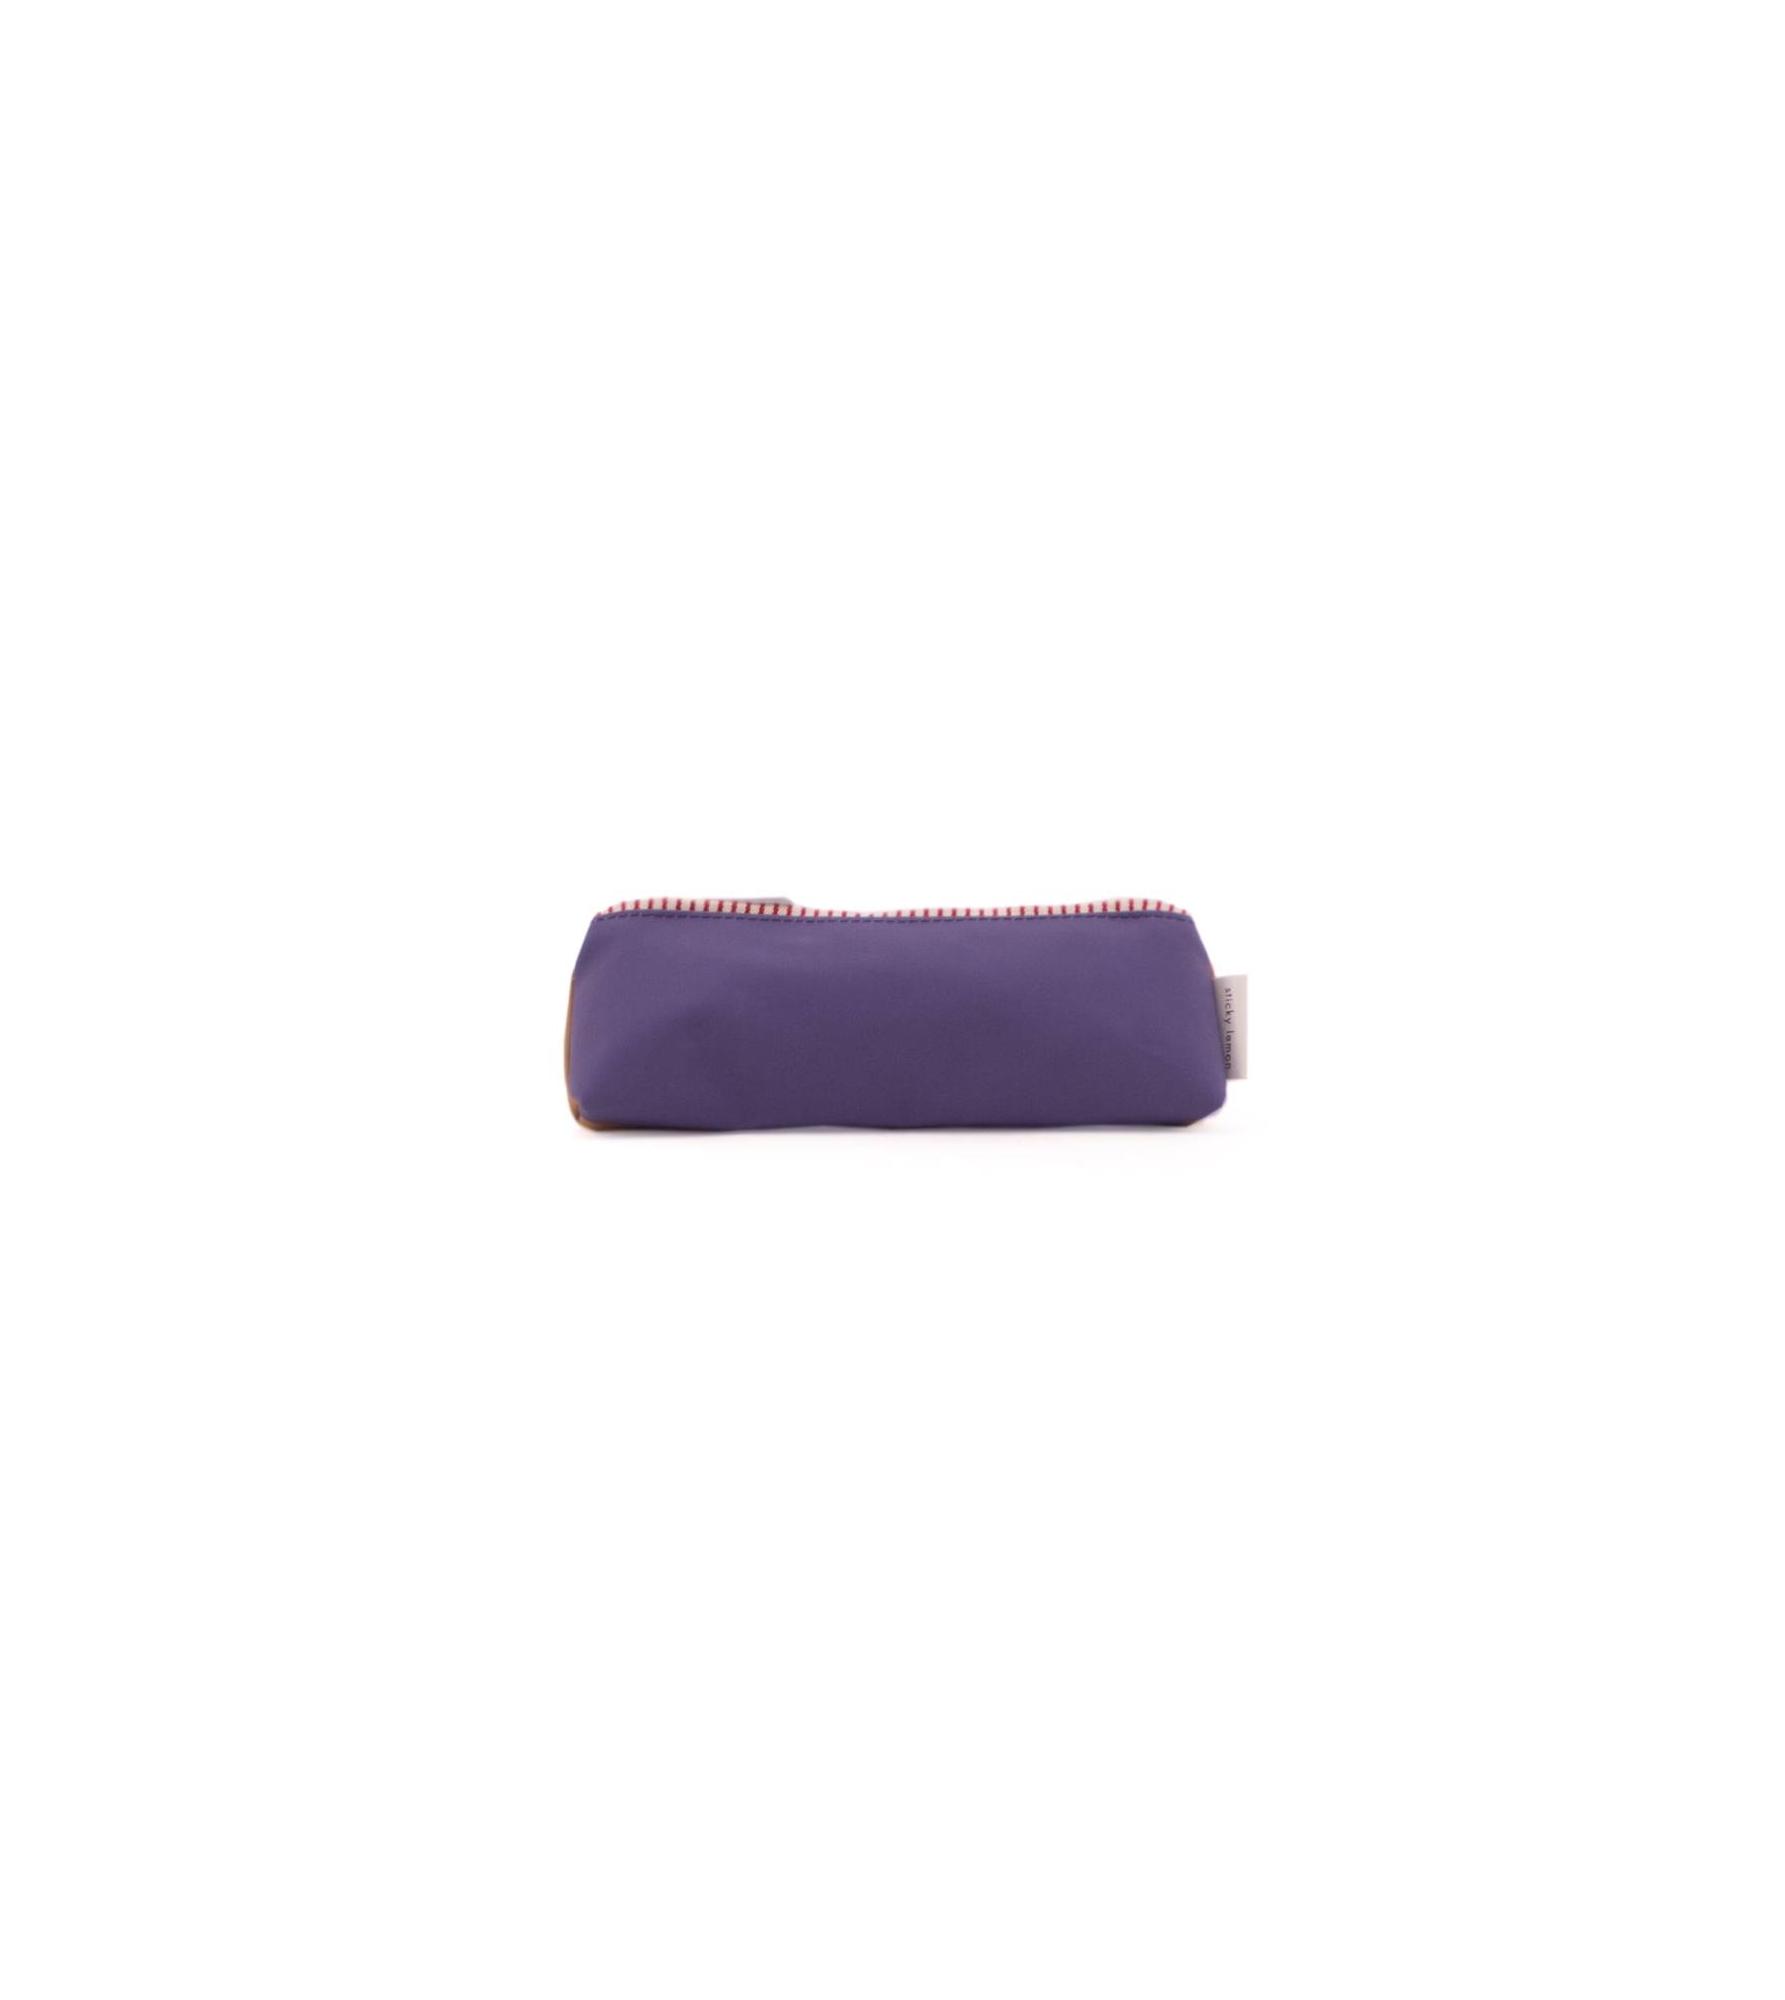 1801409 - Sticky Lemon - product - pencil case small - colour blocking - lobby purple + panache _edit.jpg